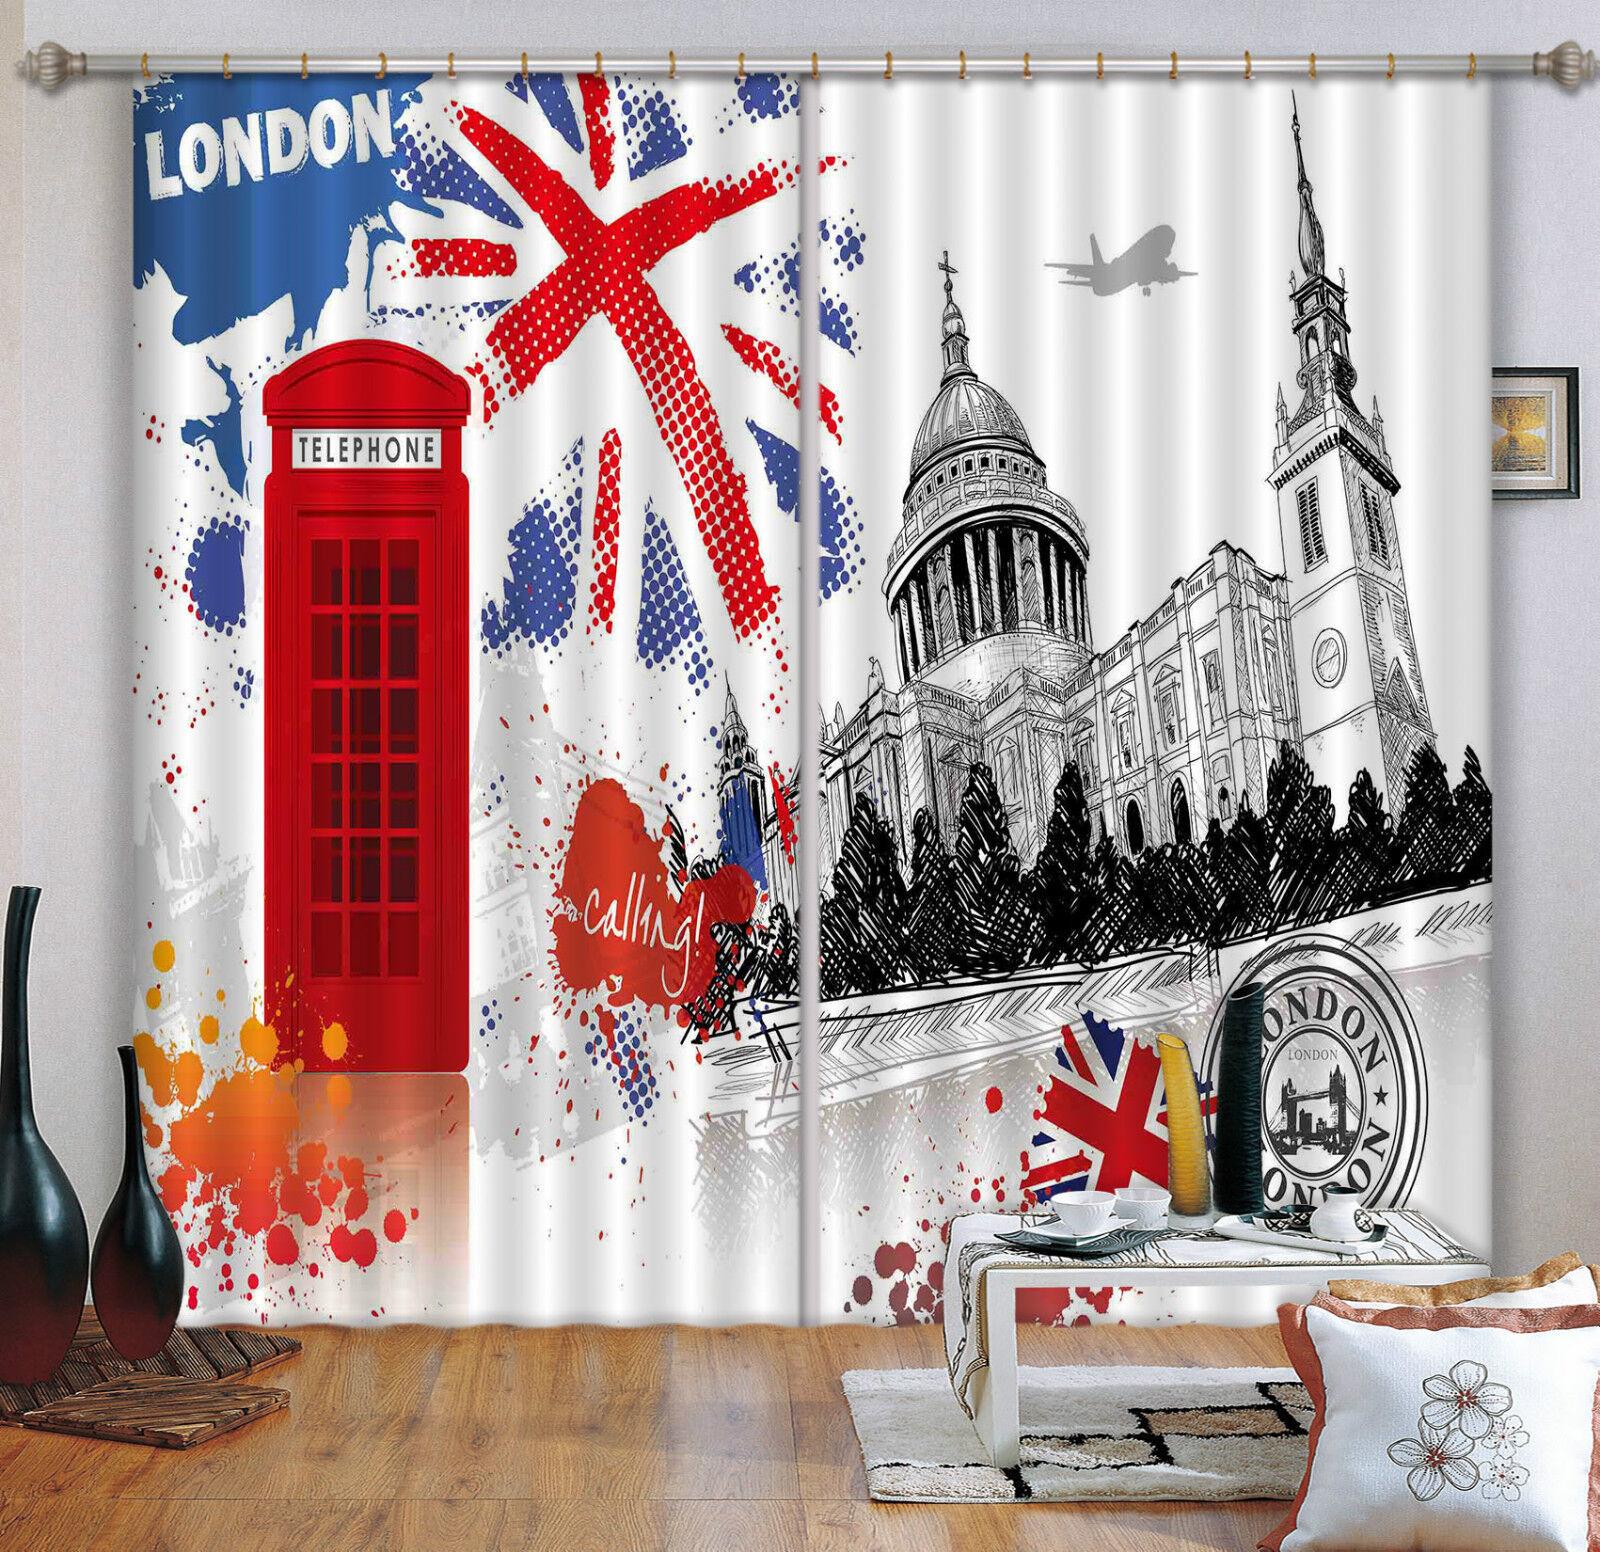 3d London patrón 09 bloqueo foto cortina cortina de impresión sustancia cortinas de ventana